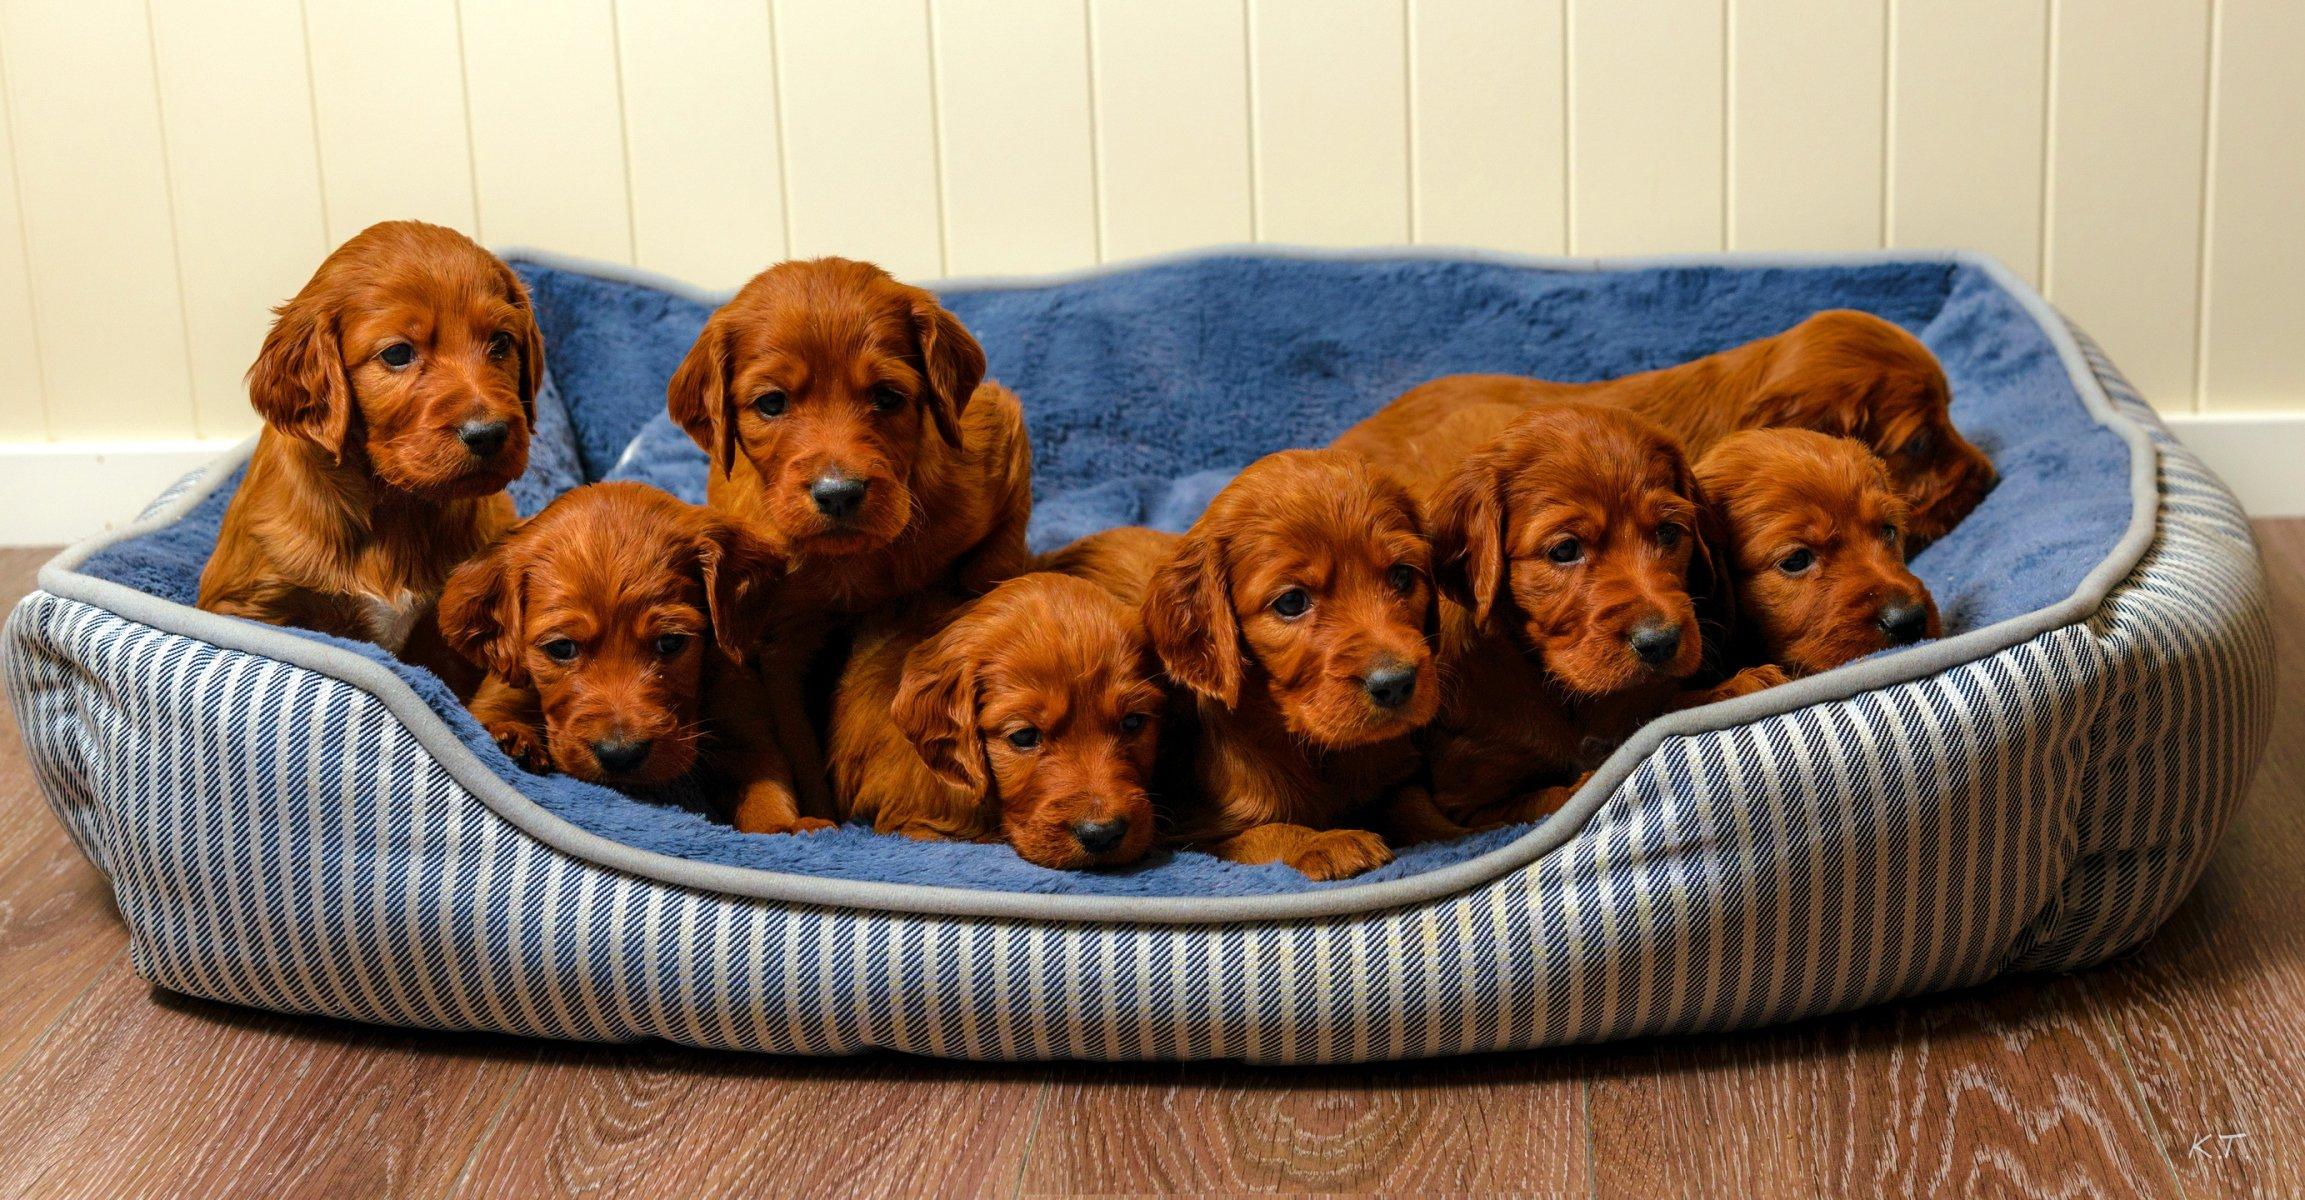 Щенки и собаки фото